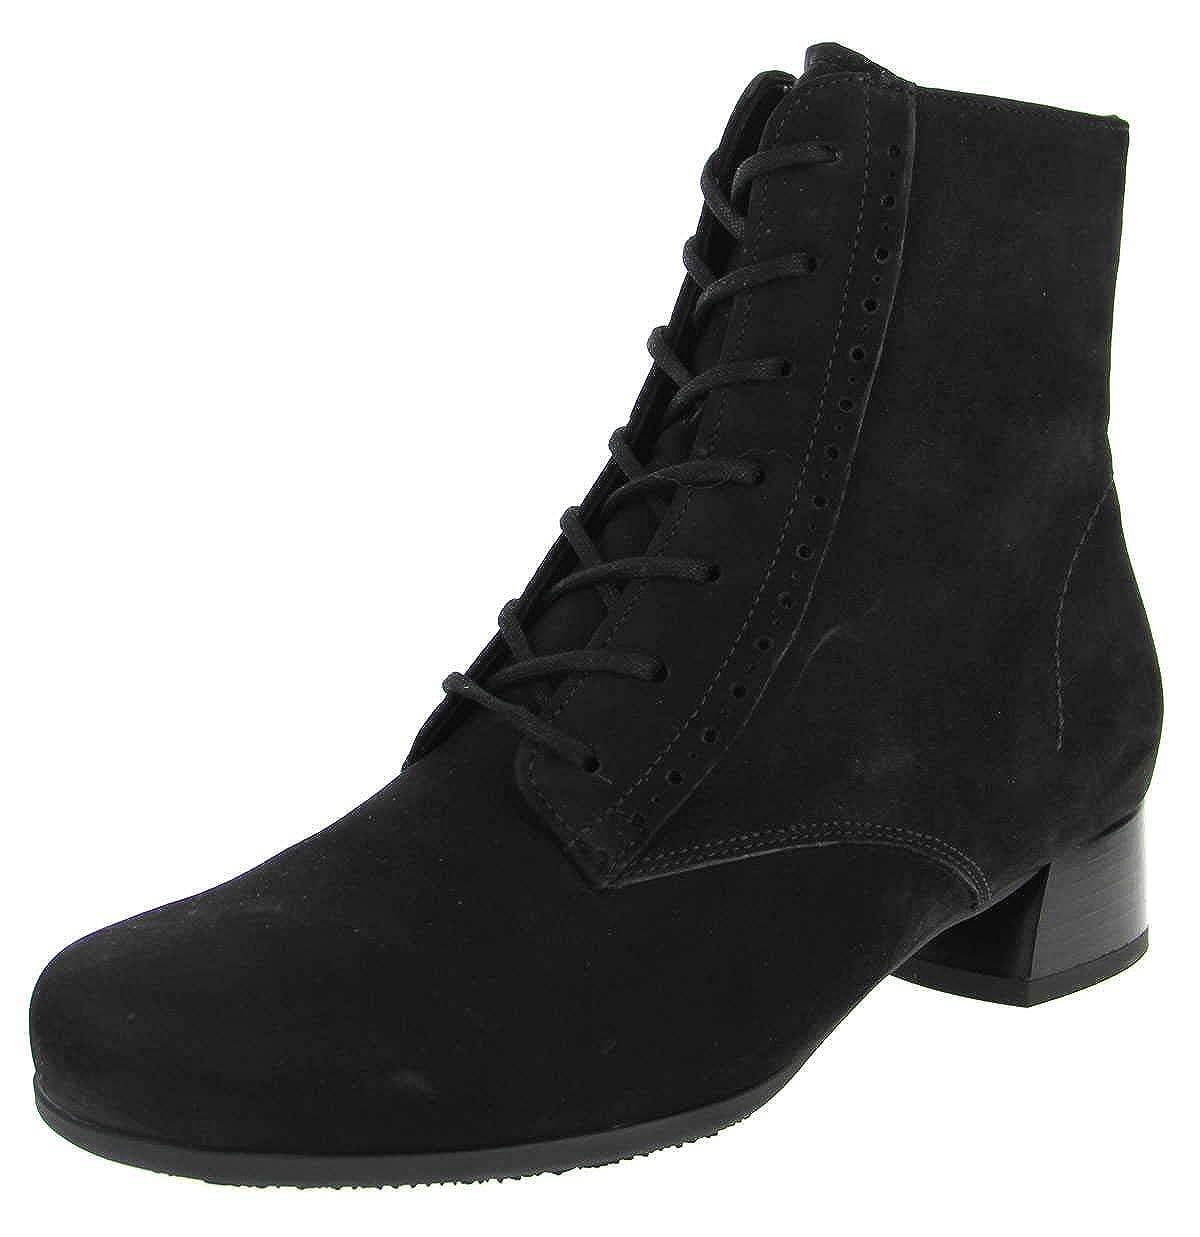 Gabor 96645-47 Damen Stiefel Stiefel Damen 4.5 - 96700f